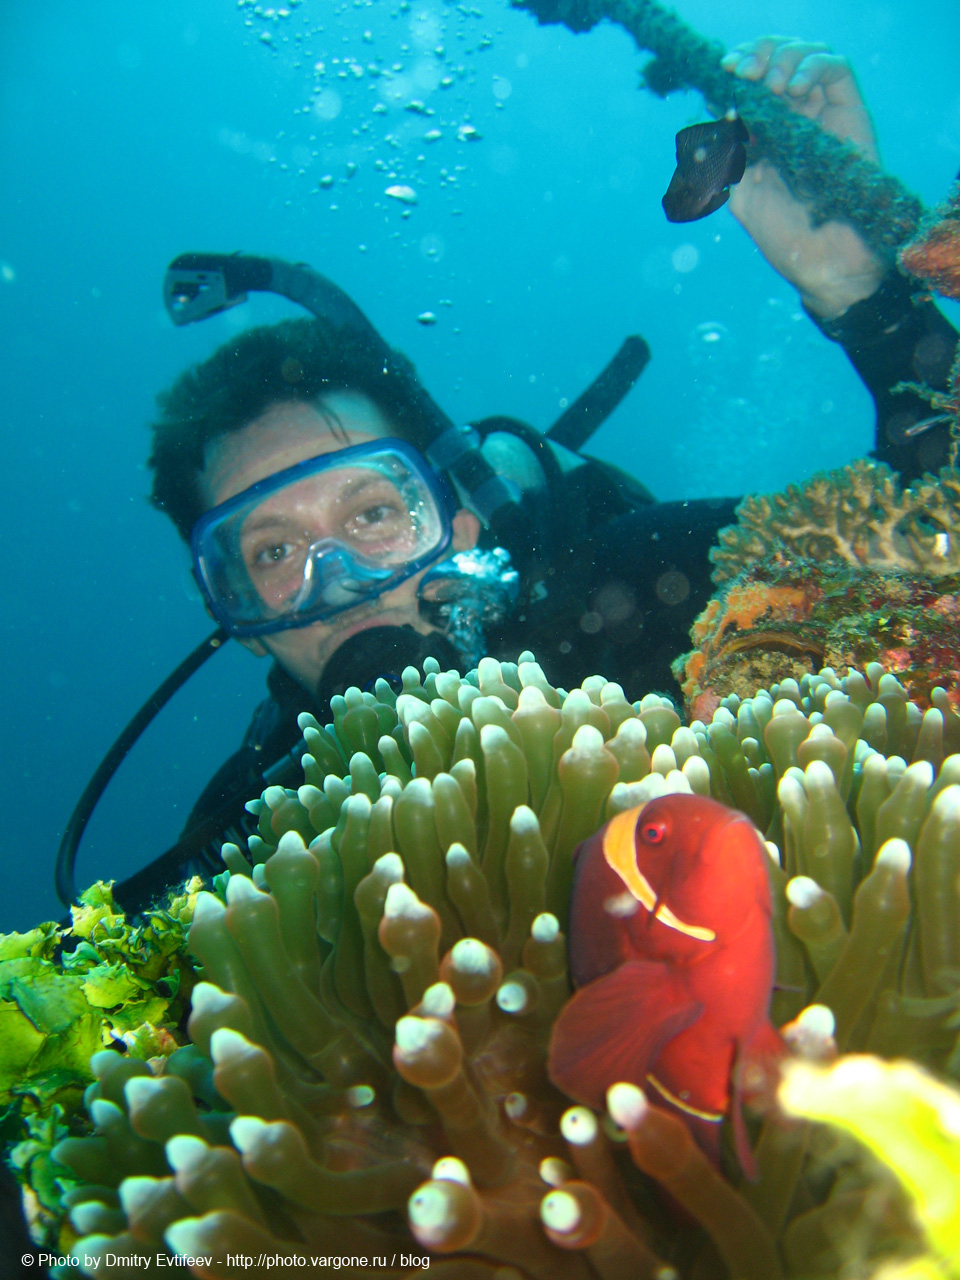 филиппины, подводное фото. на фото Дмитрий Евтифеев